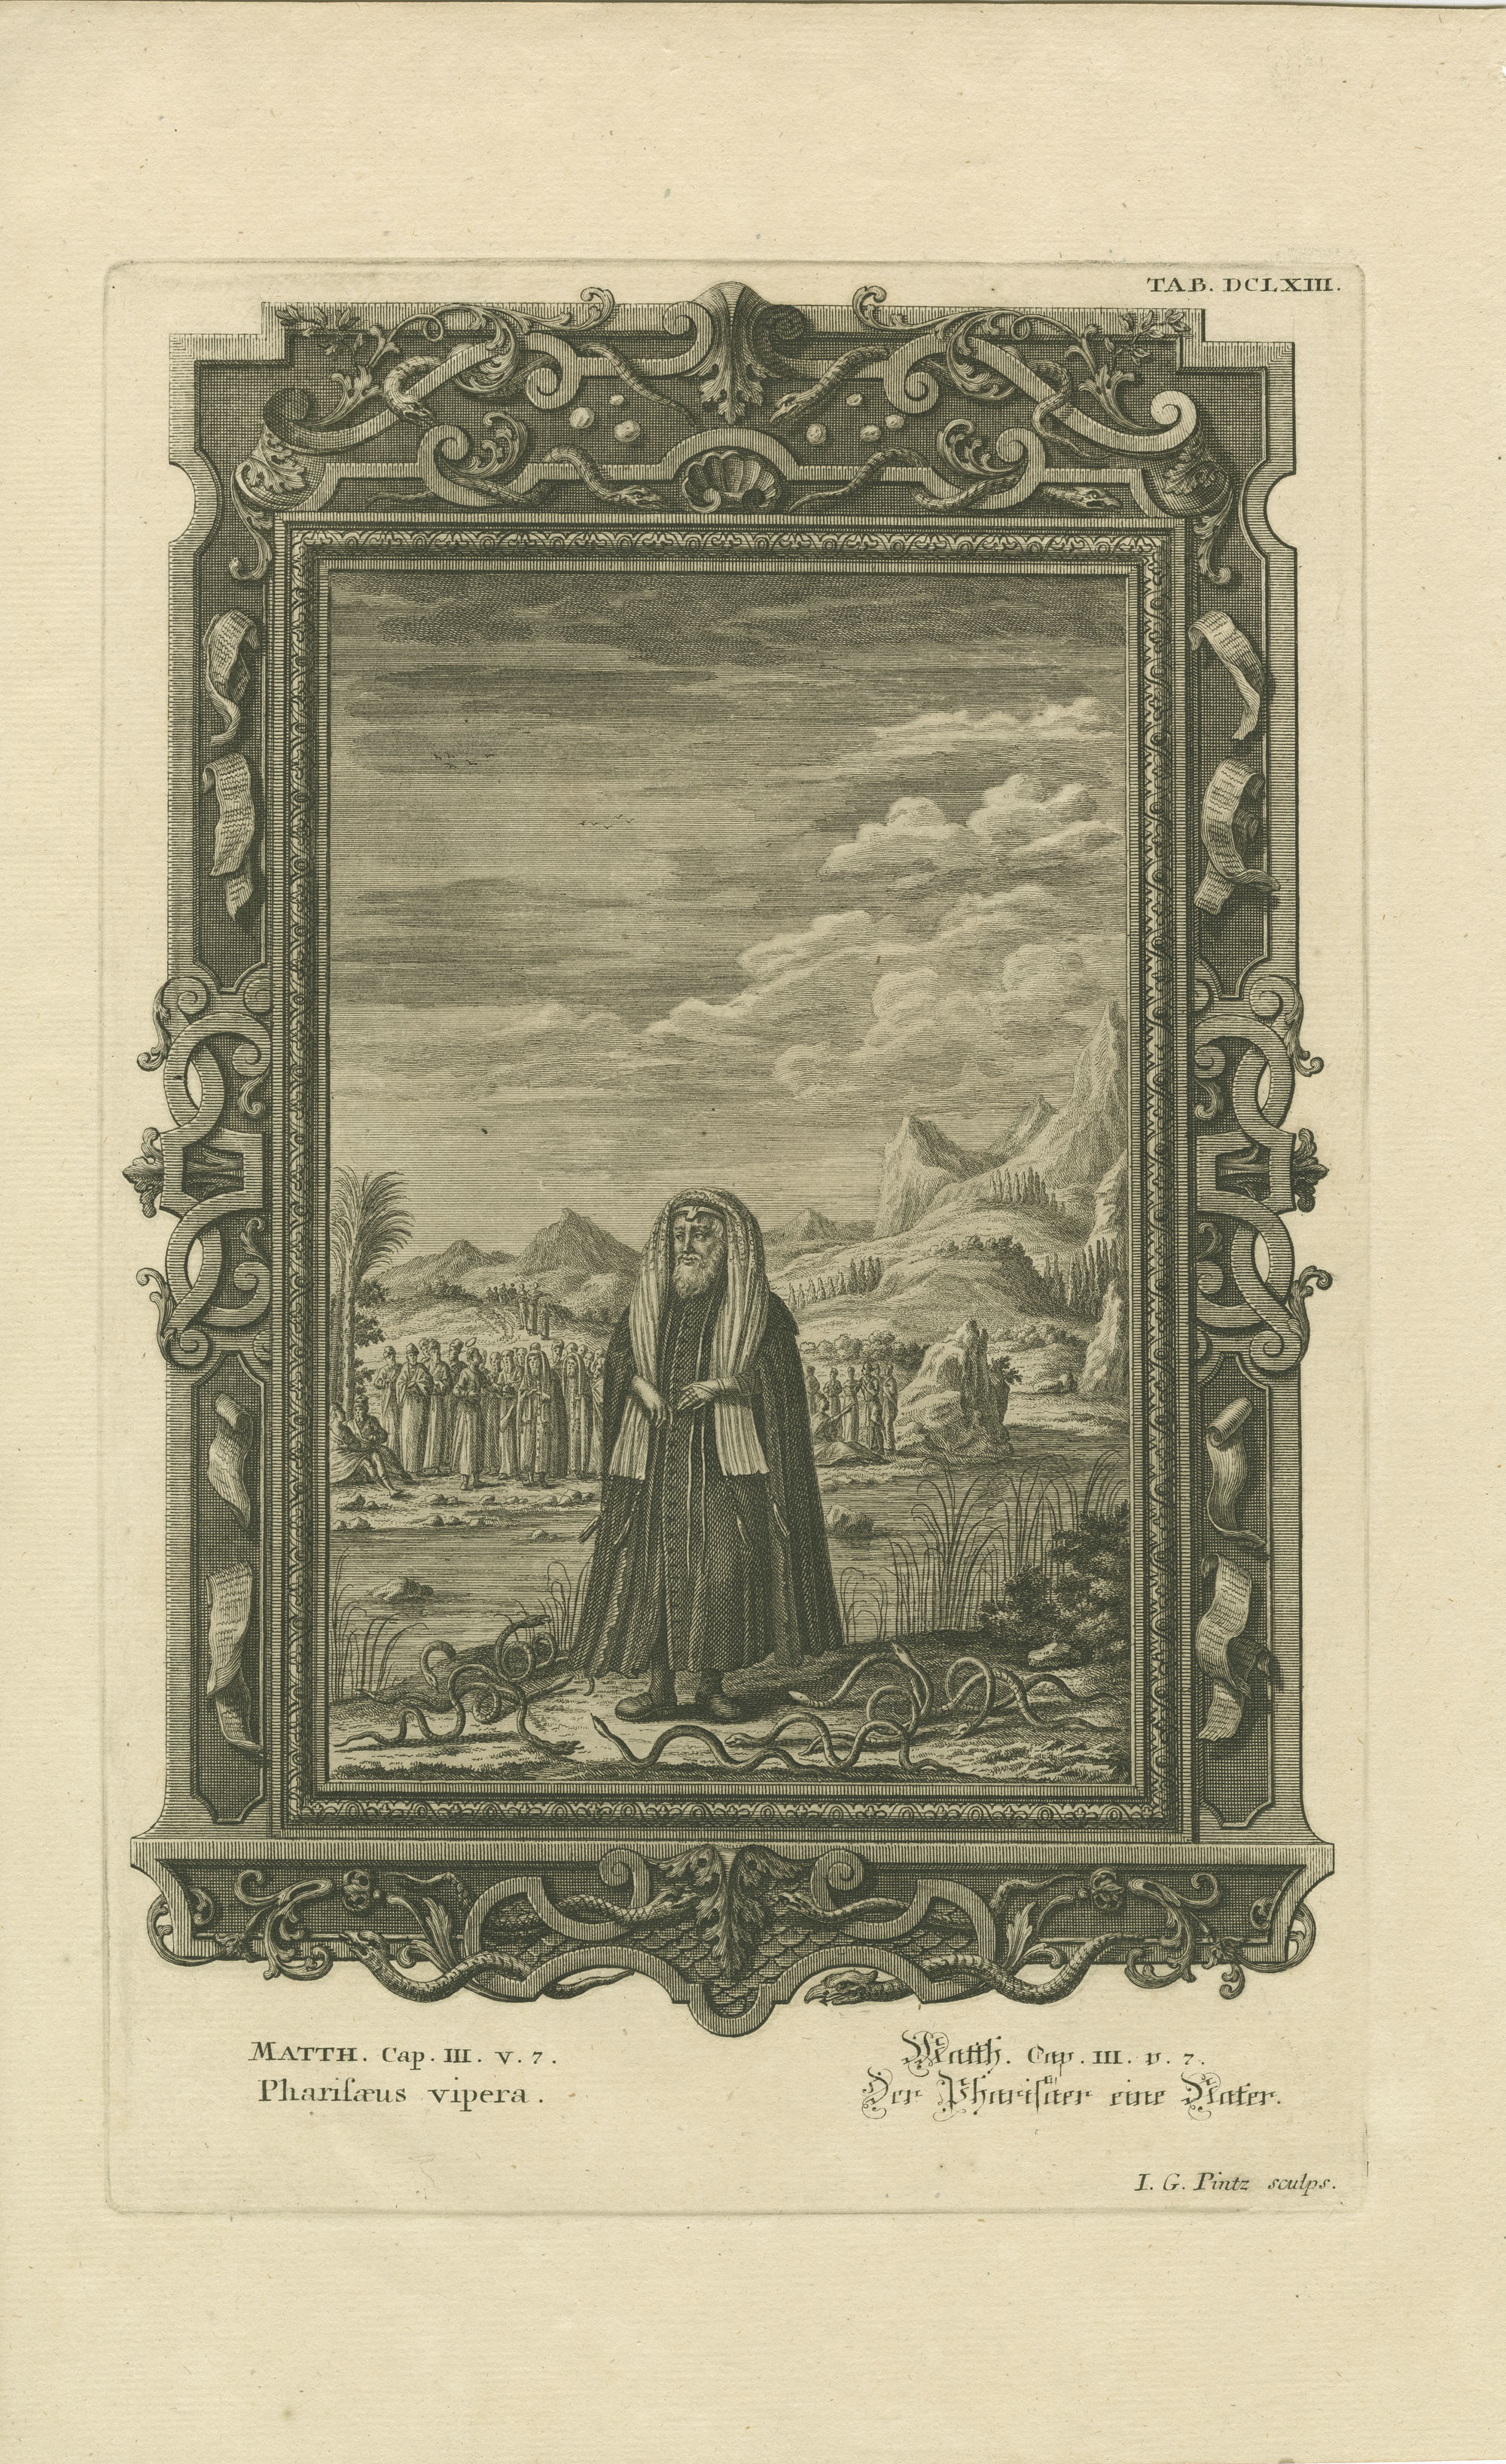 Matth. Cap. III. v. 7 Pharisæus vipera / Matth. Cap. III. v. 7 Der Pharisäer eine Nater